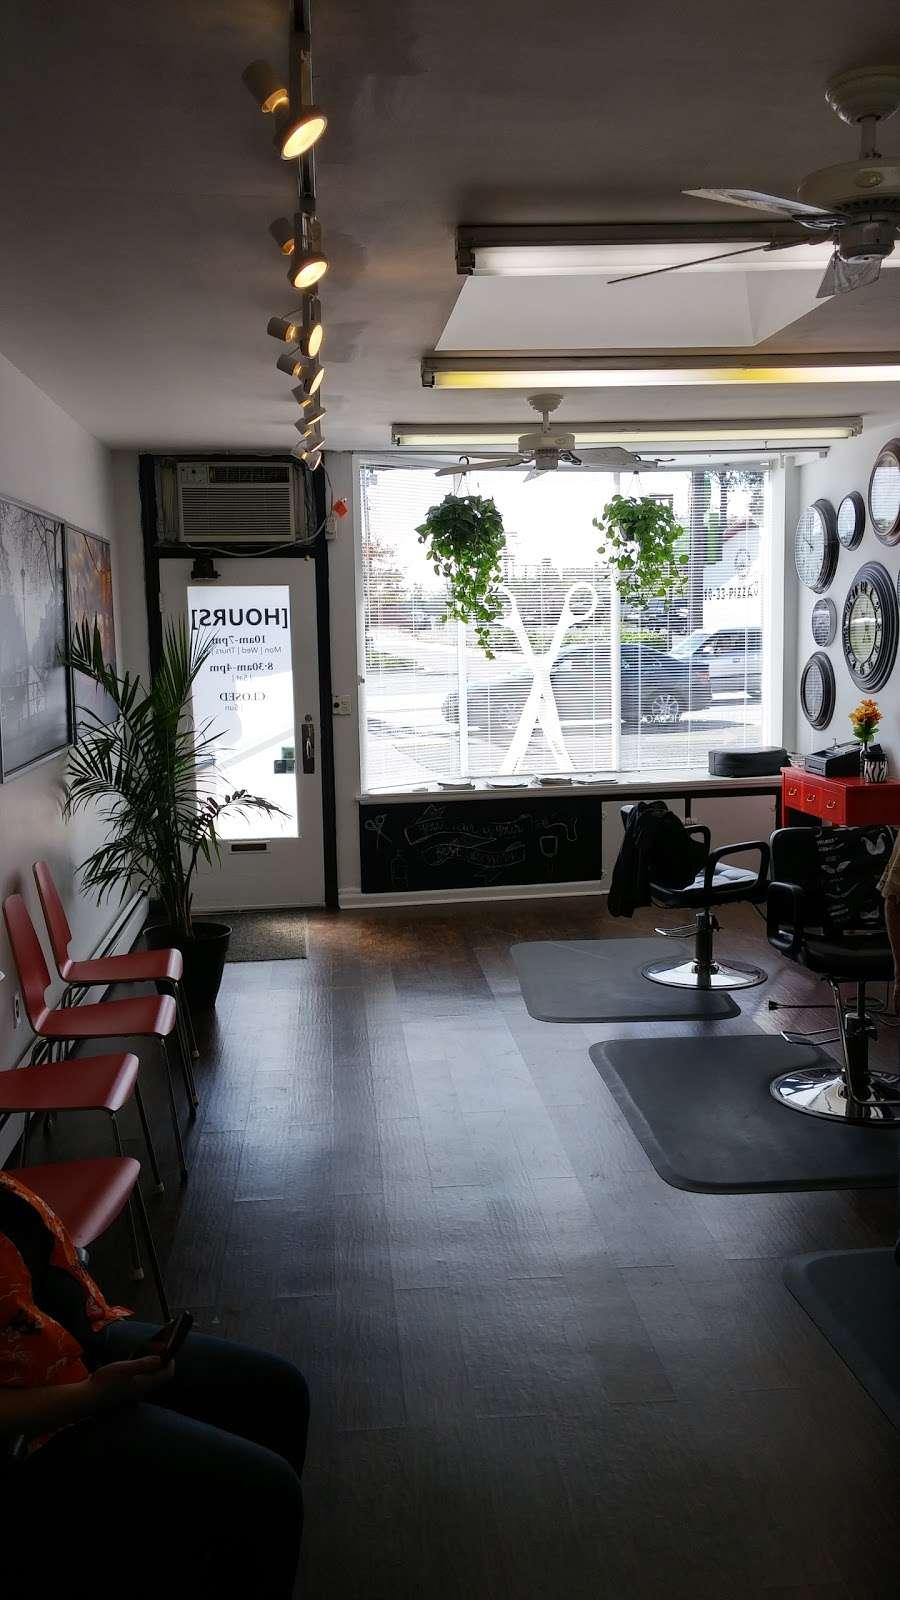 Brian Rocca Hair Studio - hair care  | Photo 3 of 6 | Address: 1644 E Joppa Rd, Towson, MD 21286, USA | Phone: (410) 321-0300